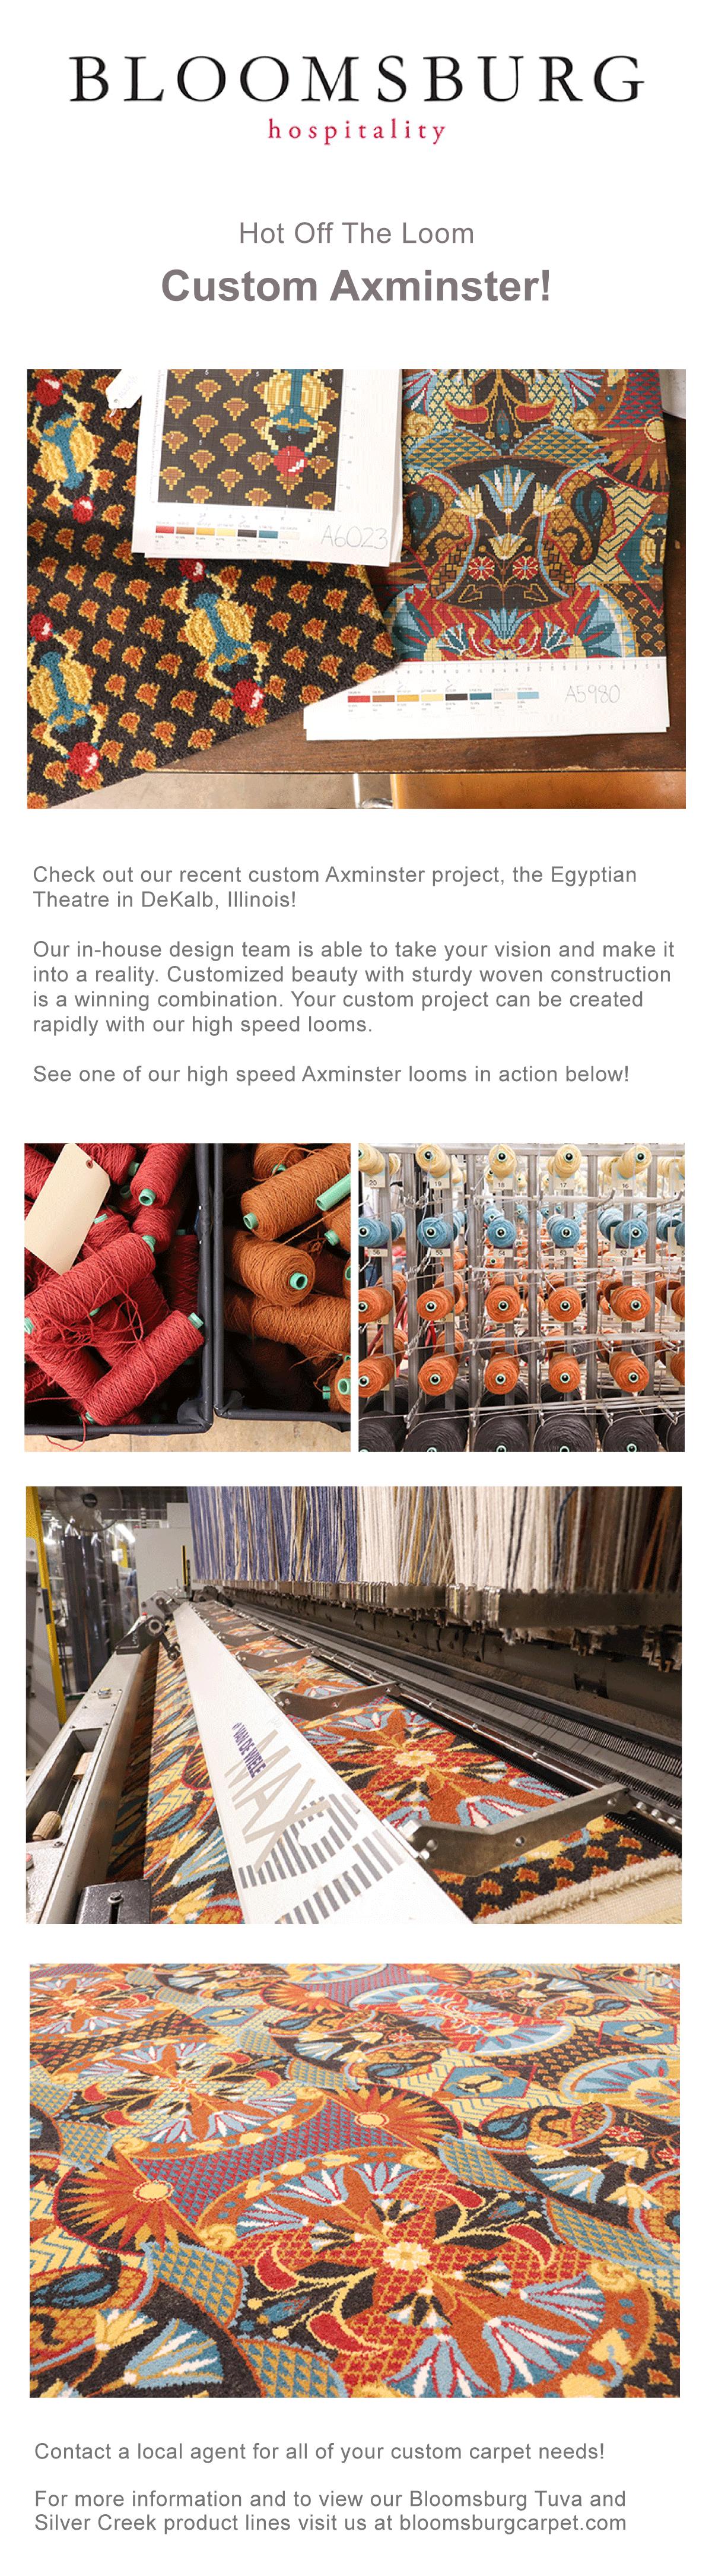 Bloomsburg Carpet Post | Hot Off The Loom: Custom Axminster